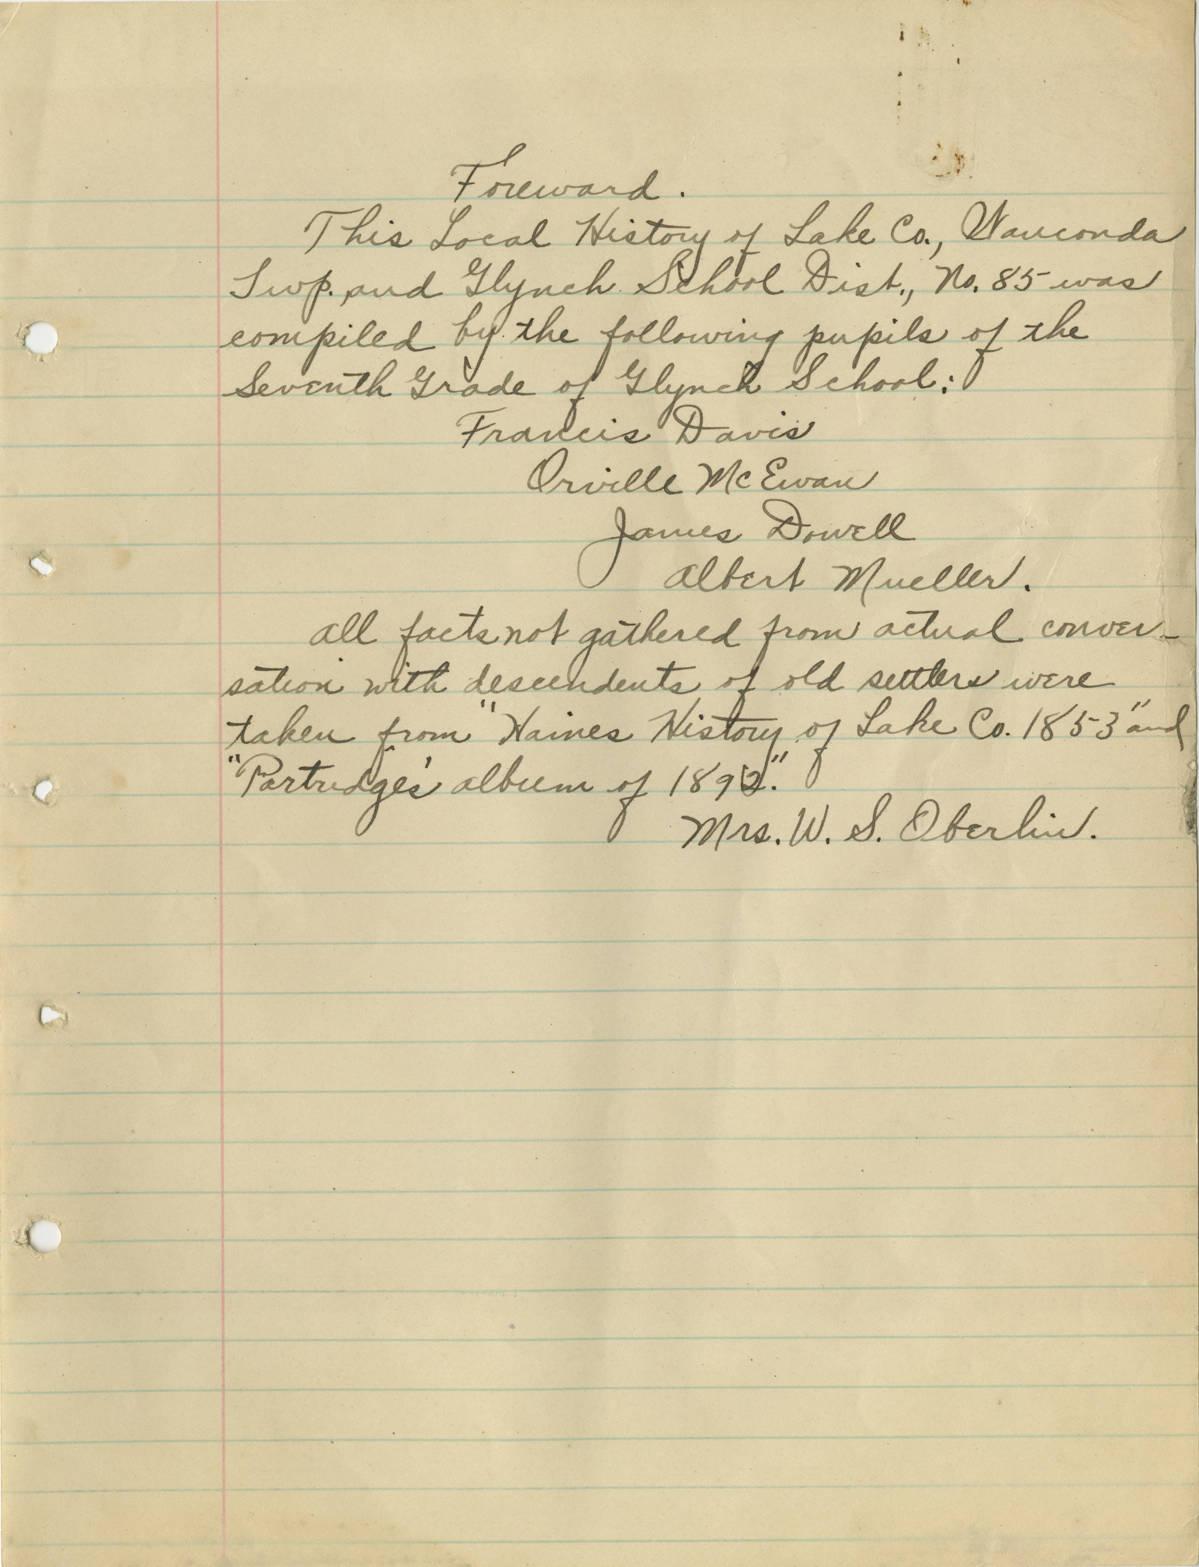 C:\Users\Vern\Documents\Fort Hill\1918 Schools Centennial\1918 Wauconda Twp Glynch School\1918_School_Histories__Wauconda_Township__Glynch_School_2003045_Page_1.jpg